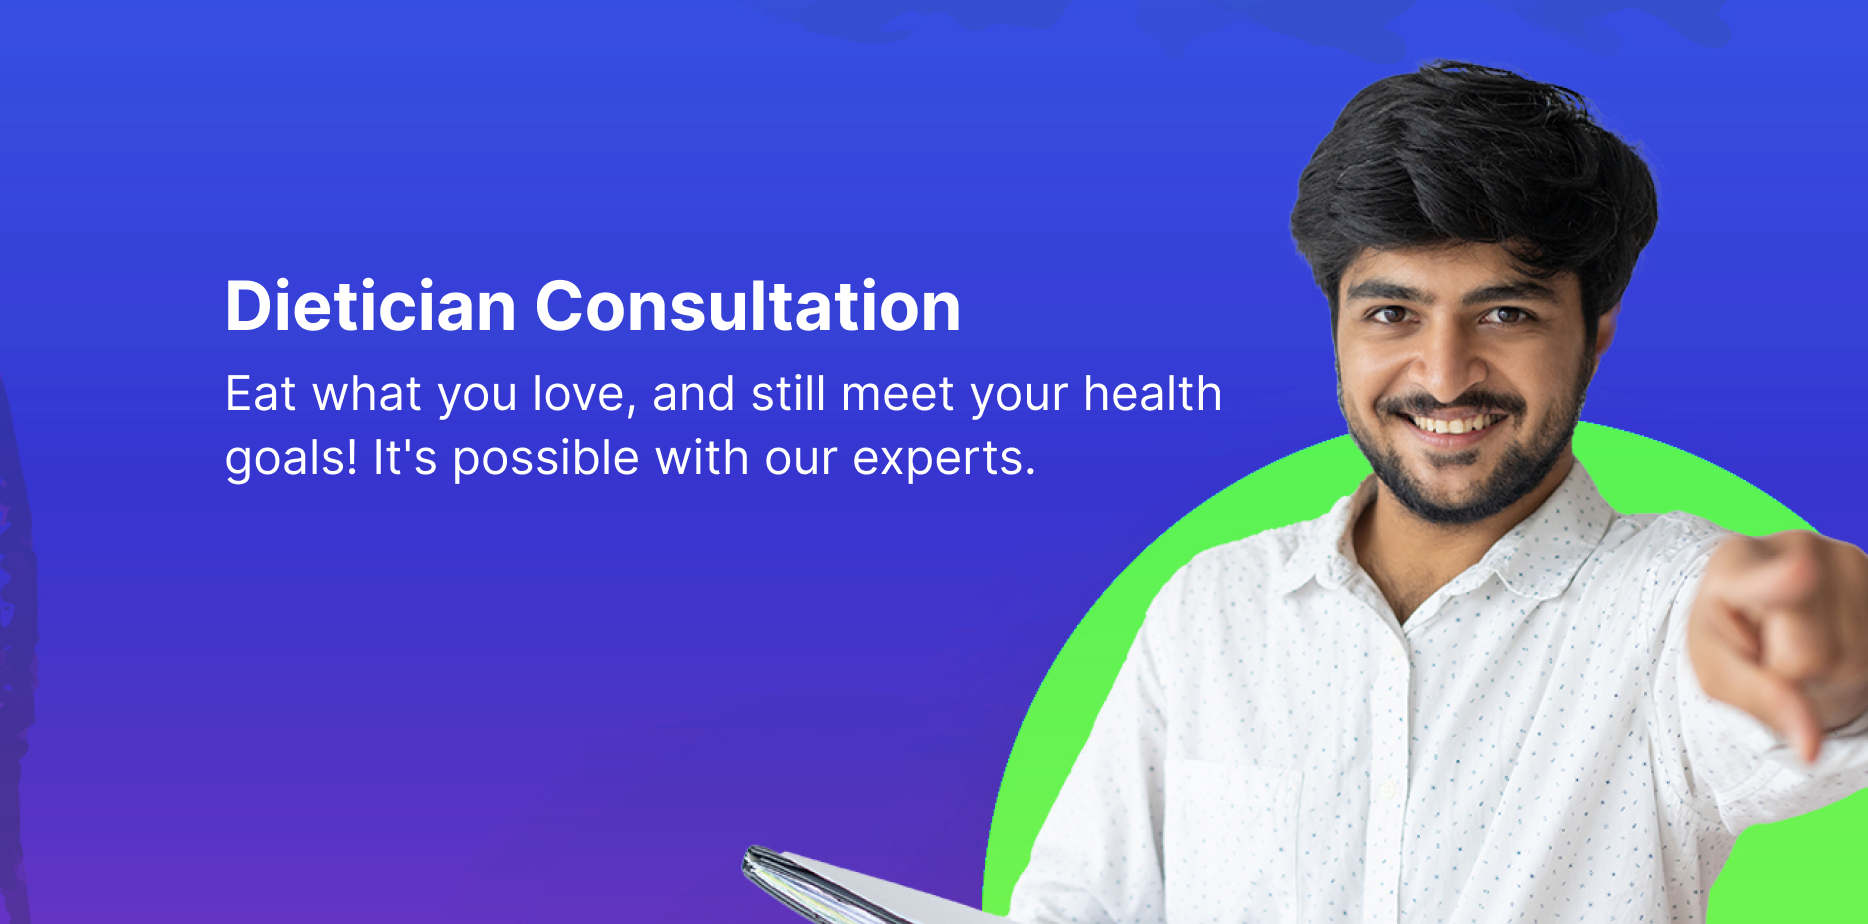 Dietician Consultation